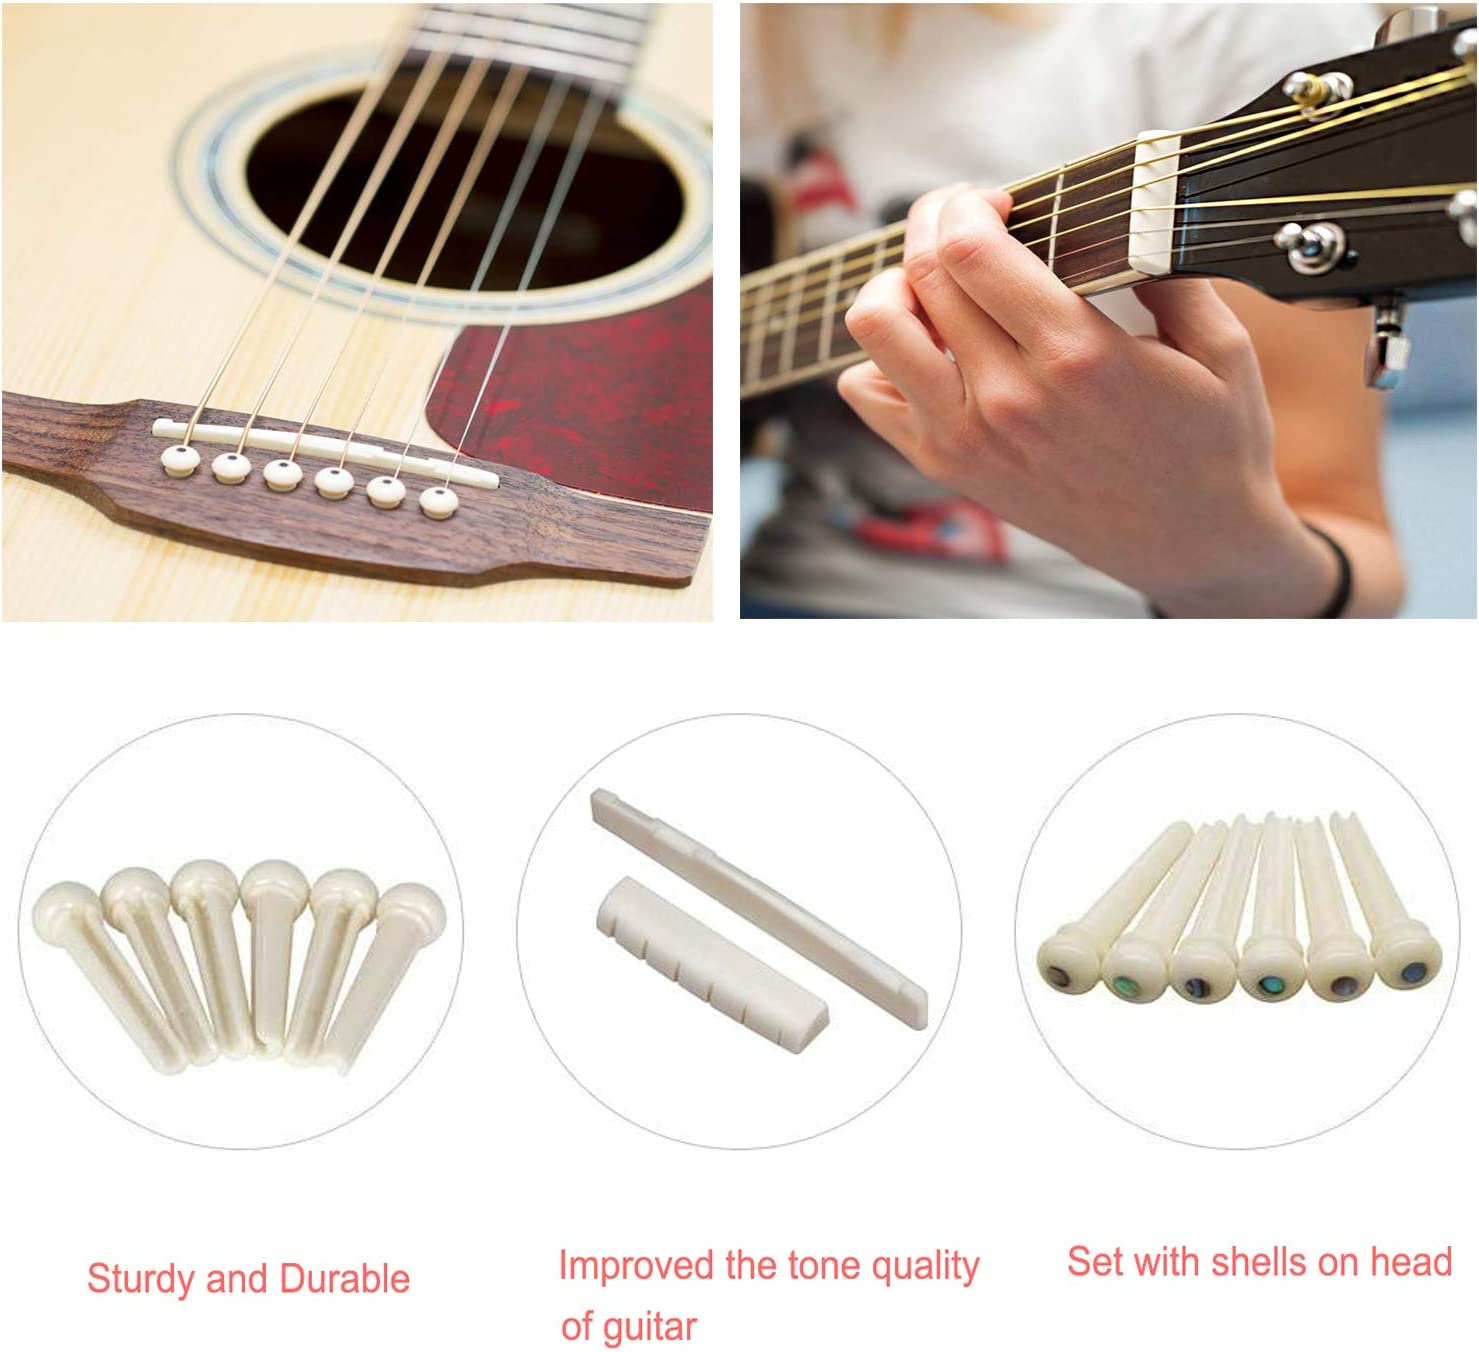 VOSON Guitar Bone Bridge Saddle /& Nut with 6pcs Guitar Bone Bridge Pins,Made of Real Bone for Acoustic Guitar